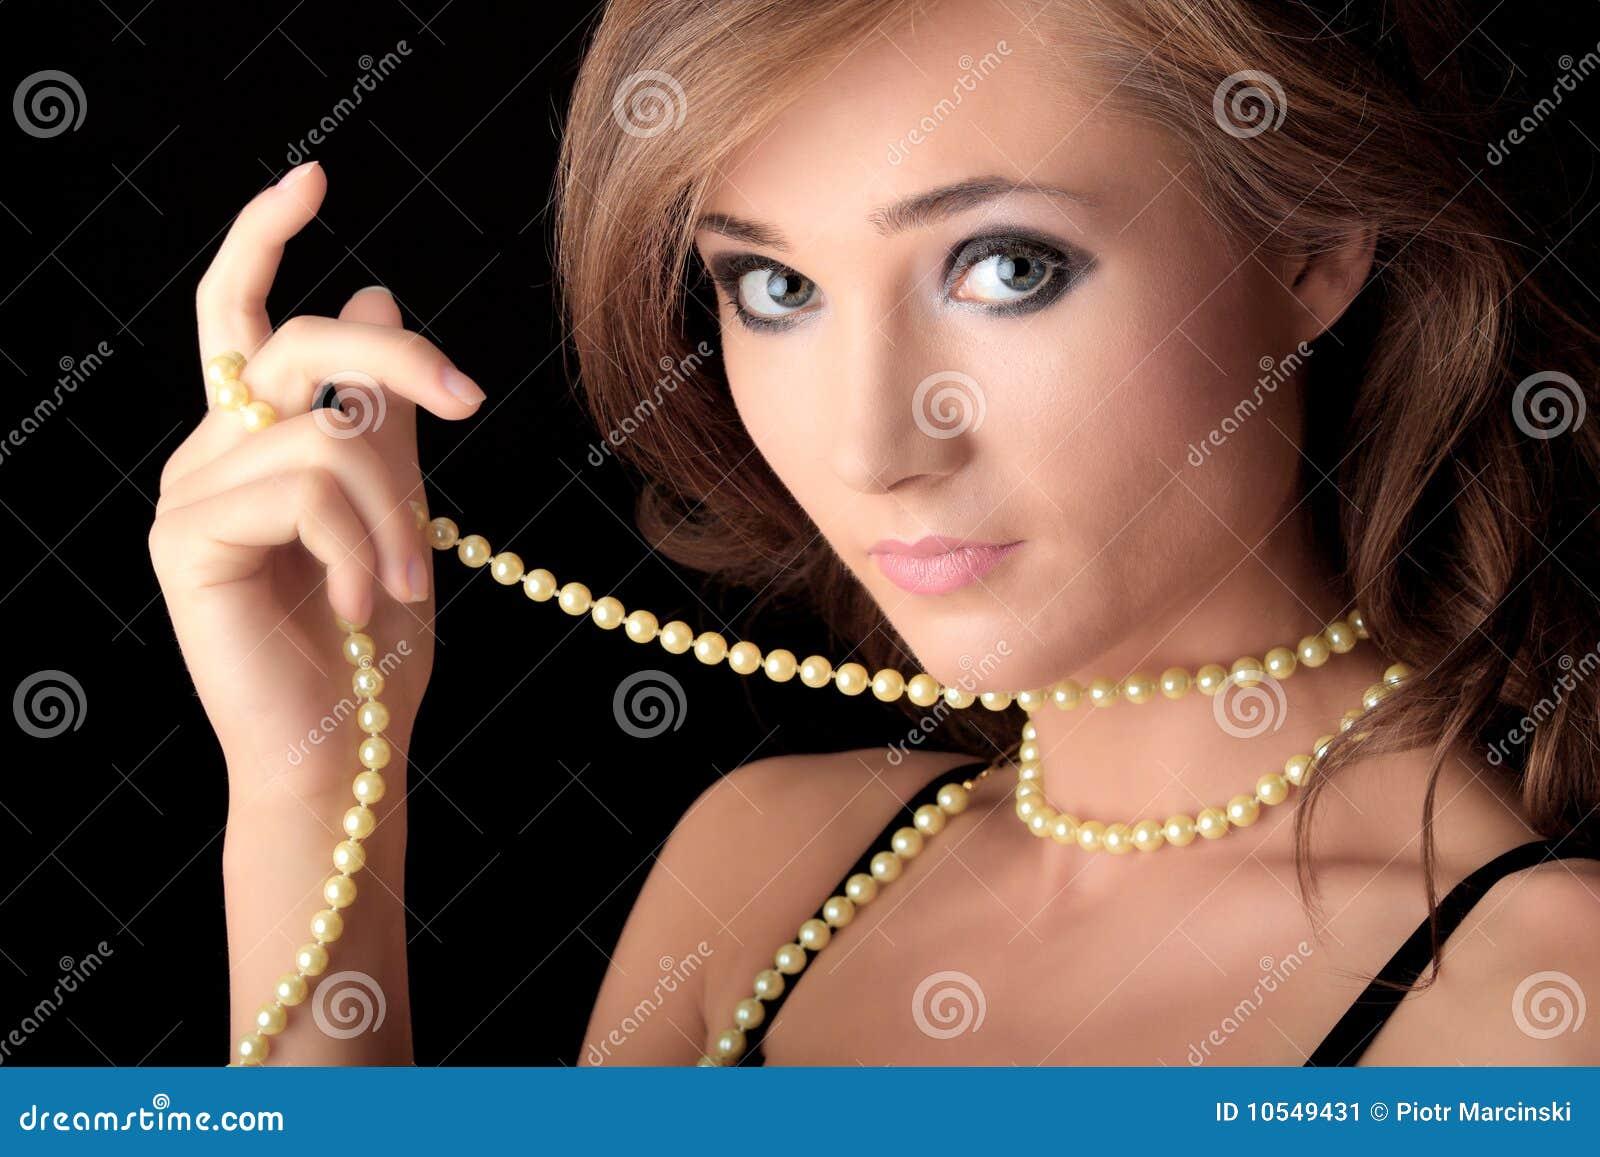 La extica belleza Miko Sinz follando luce un collar de perlas